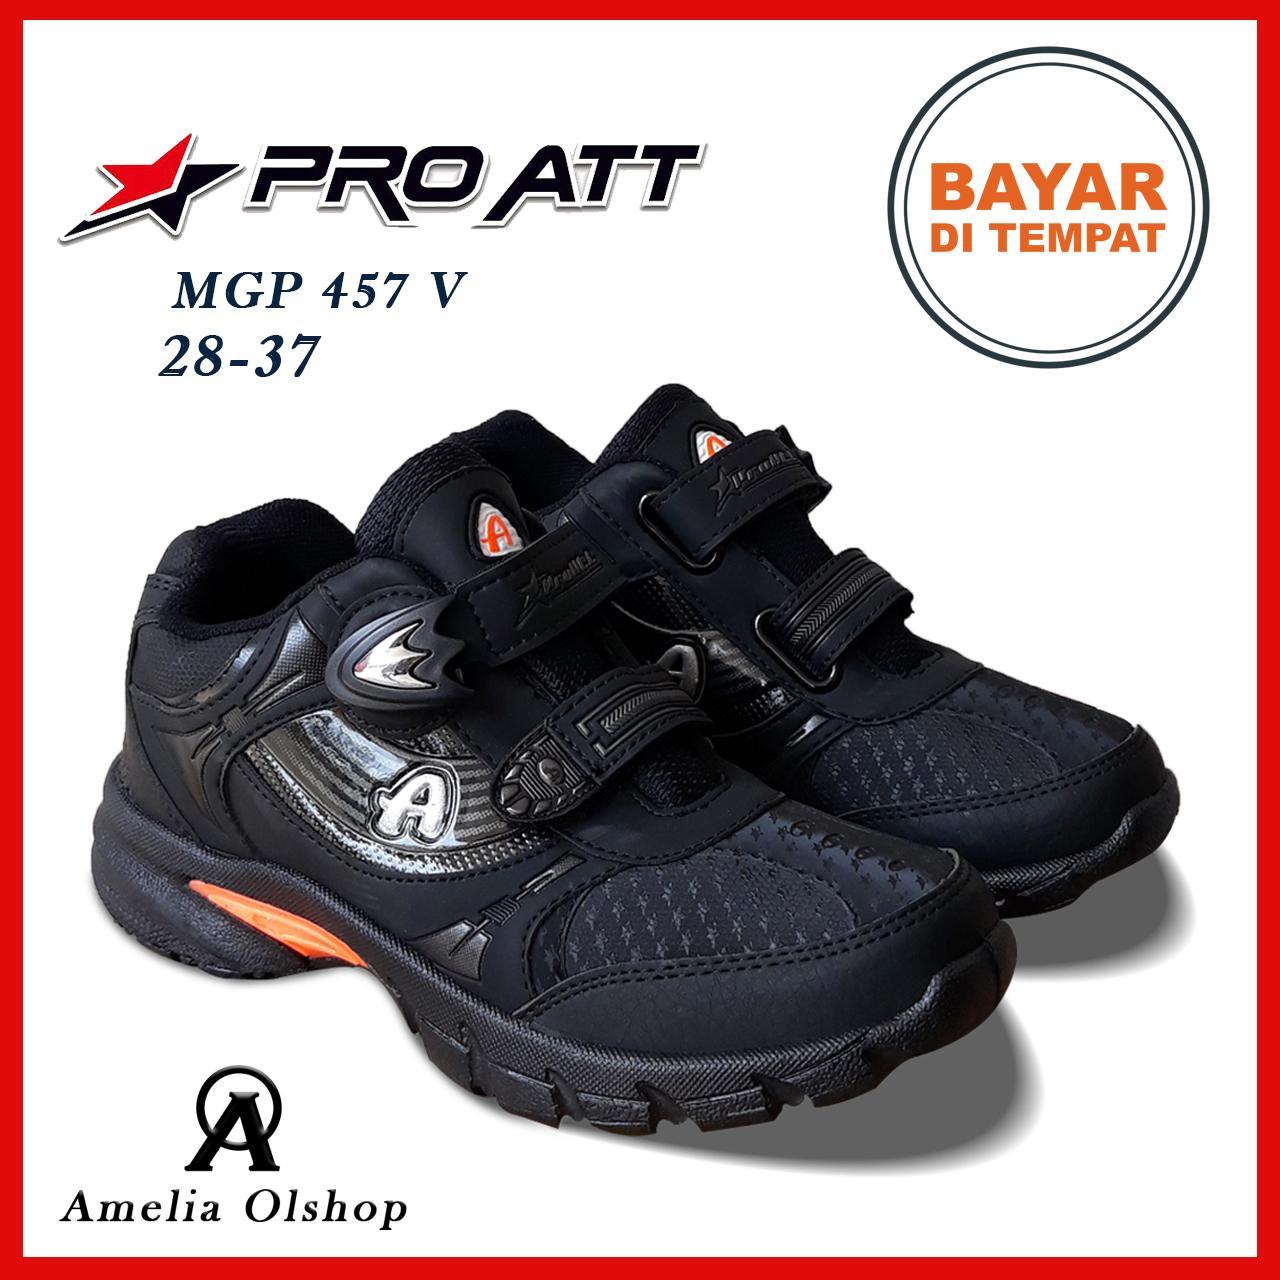 Amelia Olshop - Sepatu PRO ATT MGP 28-37   Sepatu Sekolah   Sepatu Hitam 3150e78c19